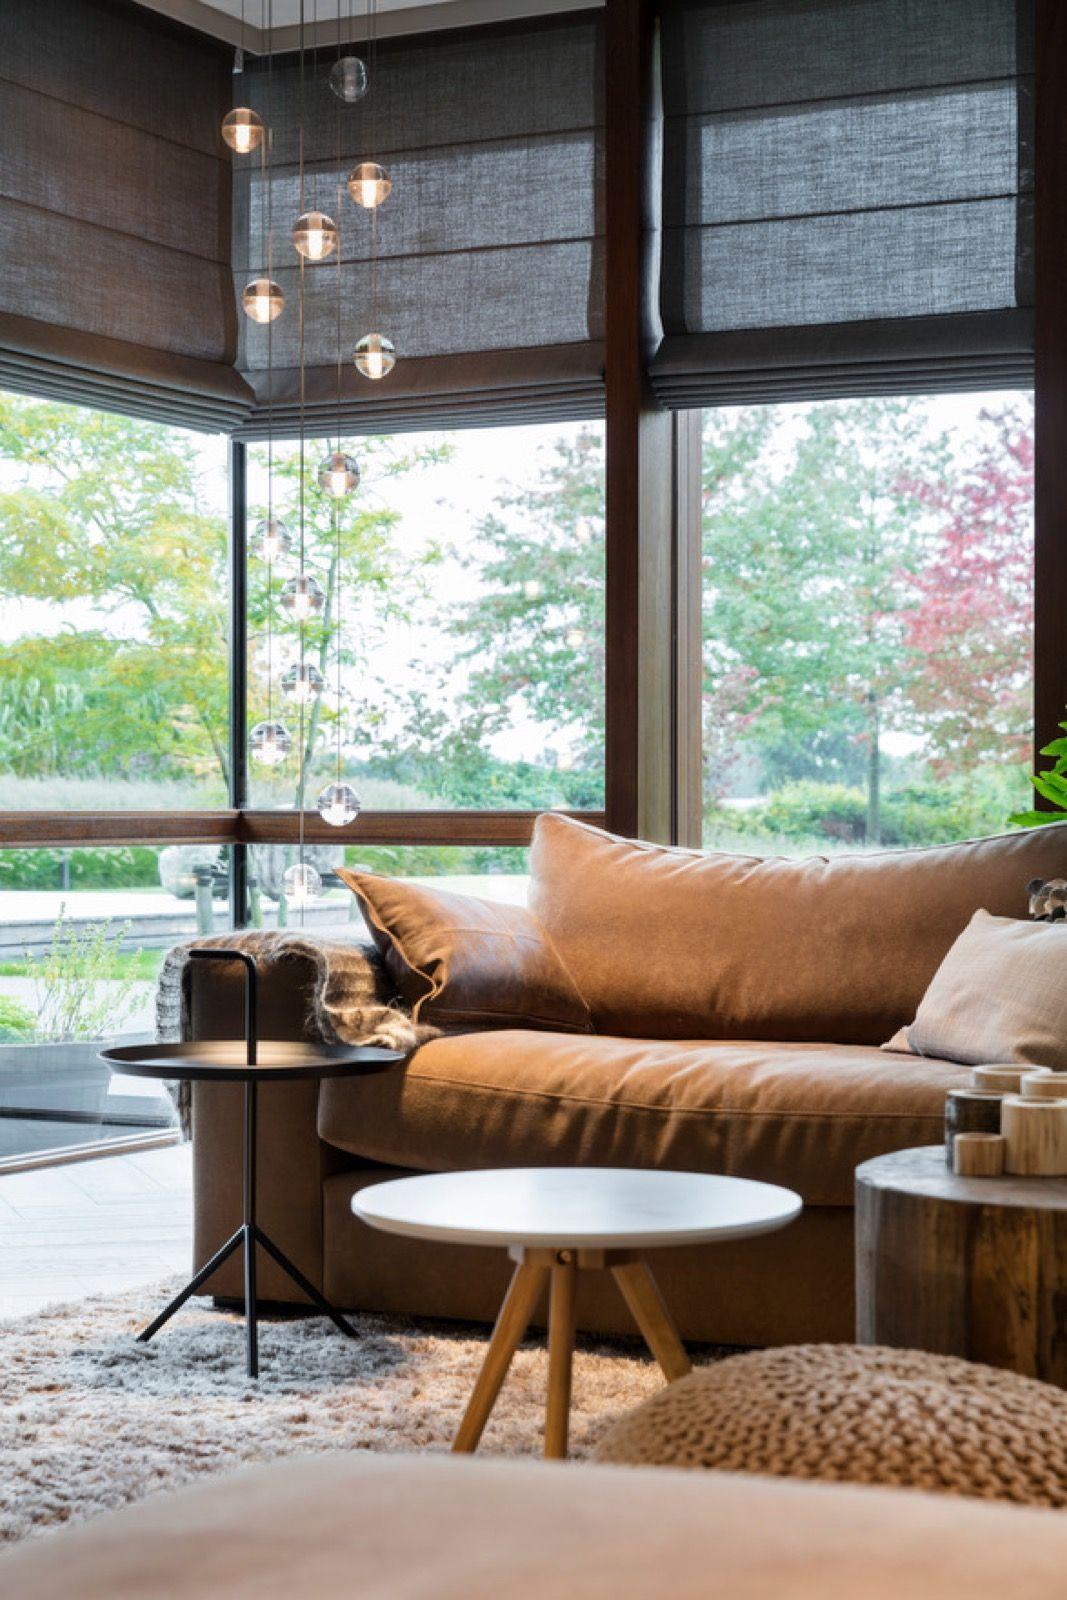 Sala de estar com janelas de vidro e persiana preta